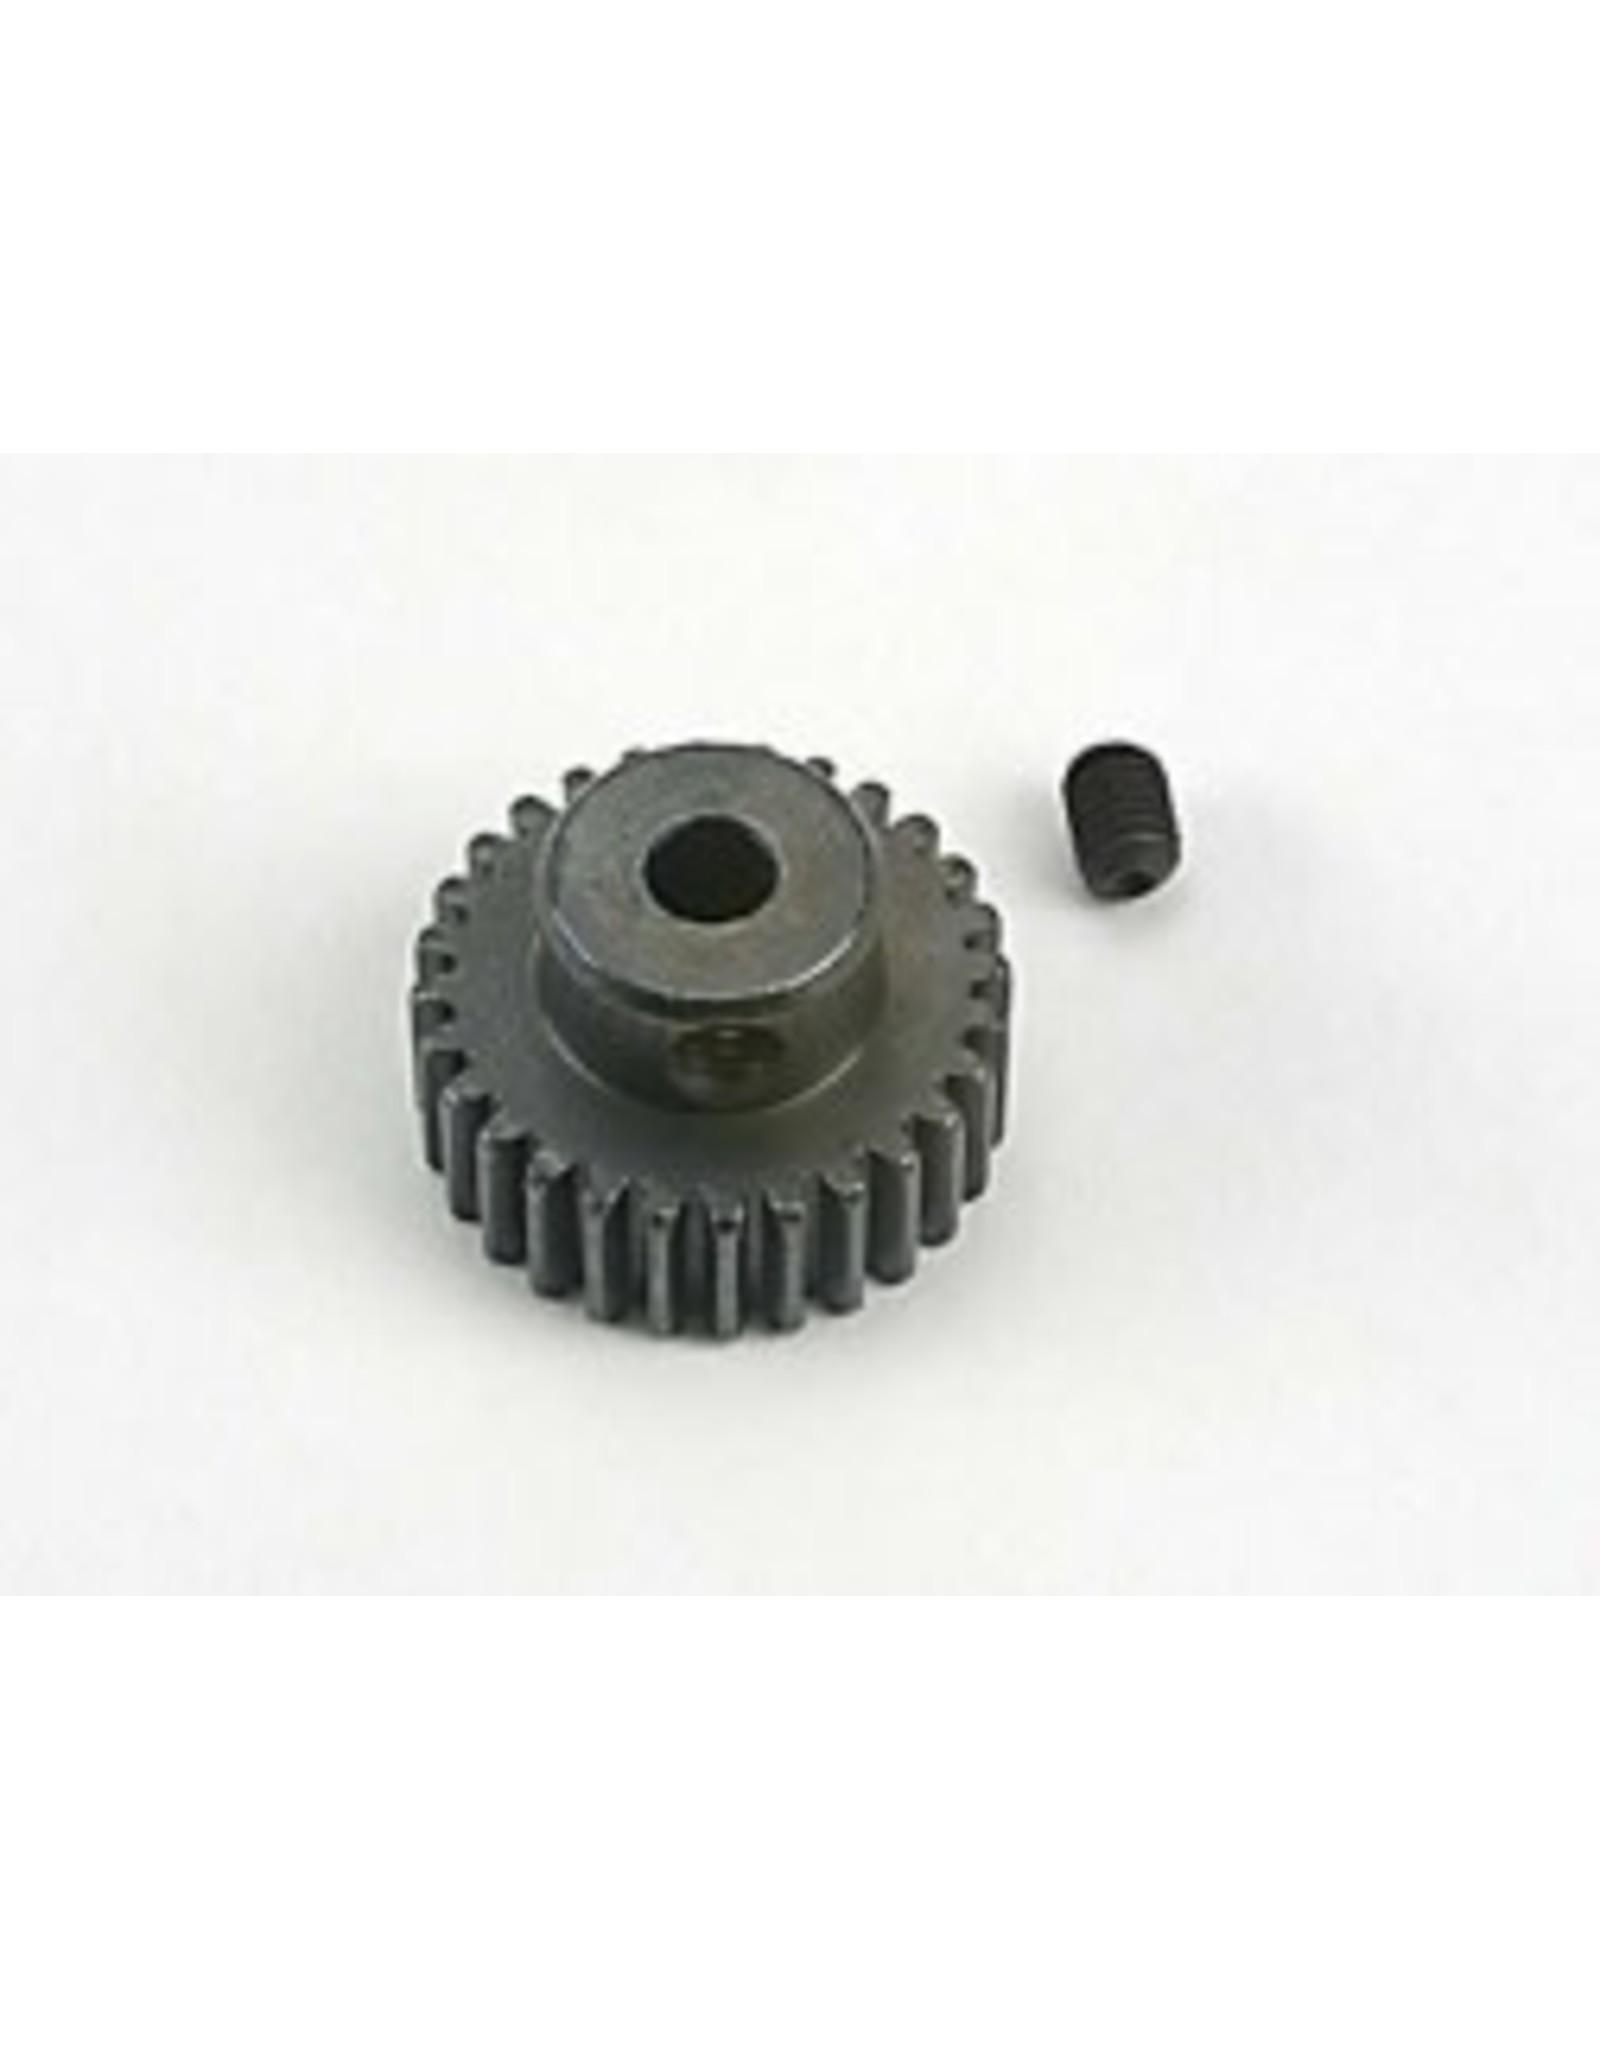 Traxxas Gear, pinion (28-tooth) (48-pitch)/ set screw